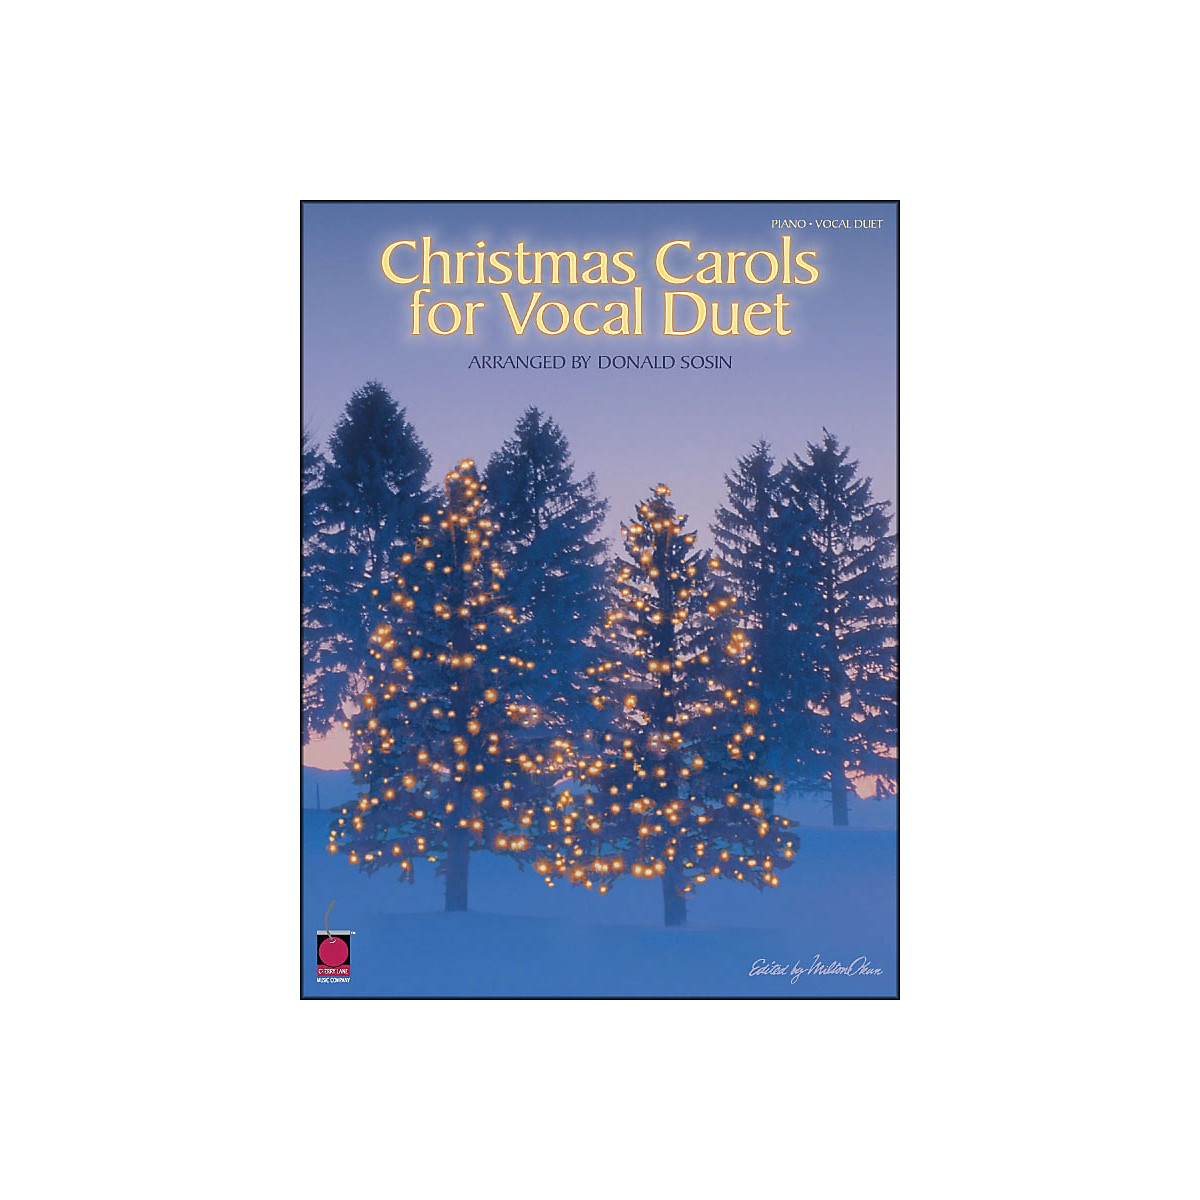 Cherry Lane Christmas Carols for Vocal Duet